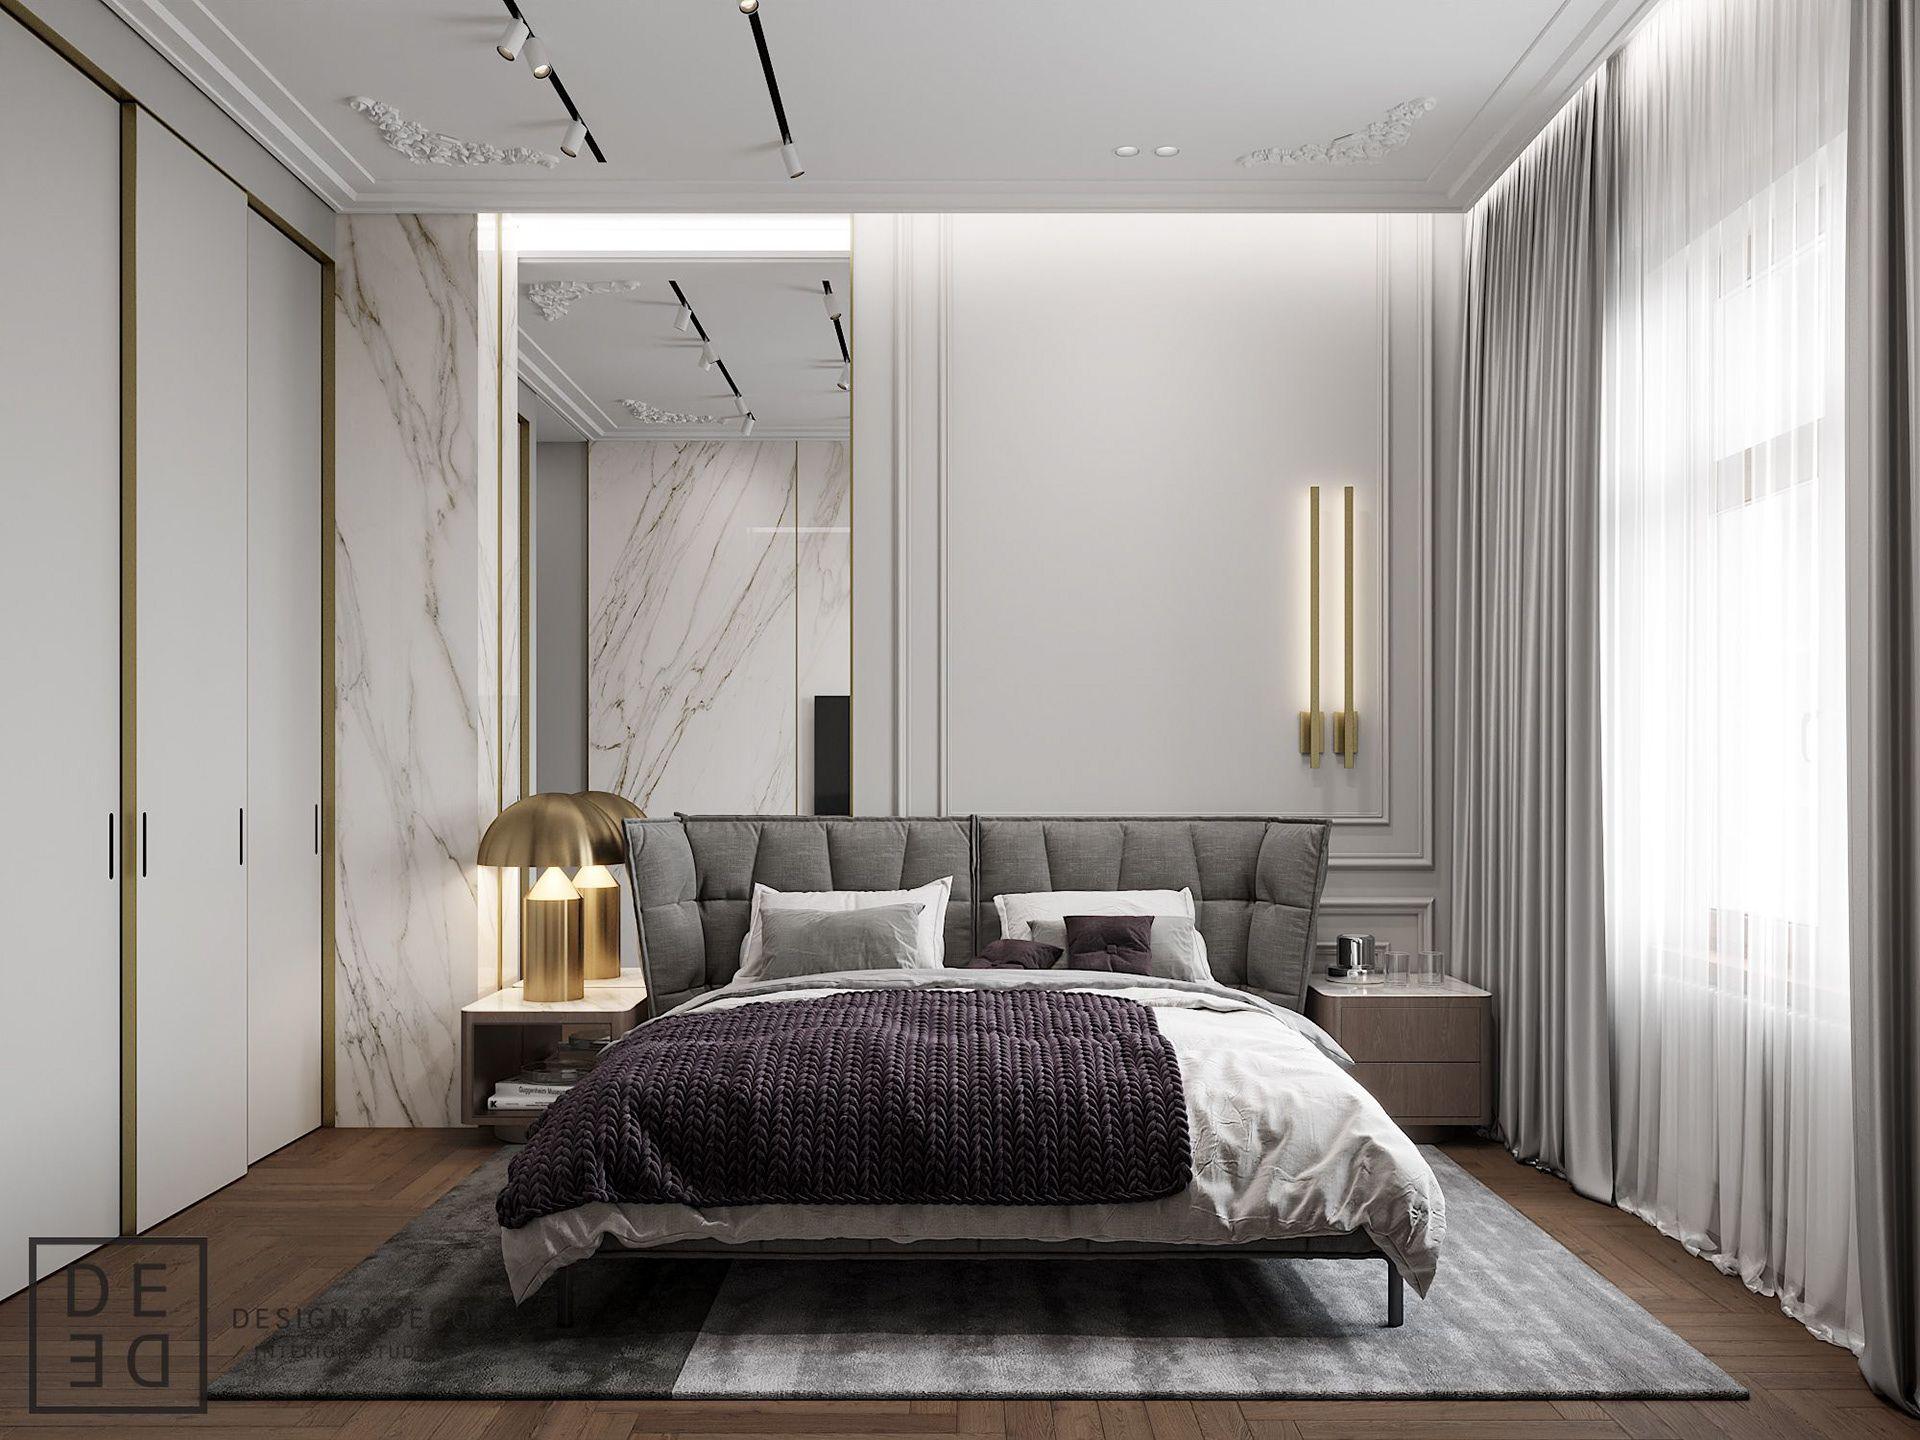 Best De De Fusion Apartment On Behance Modern Bedroom Design 400 x 300